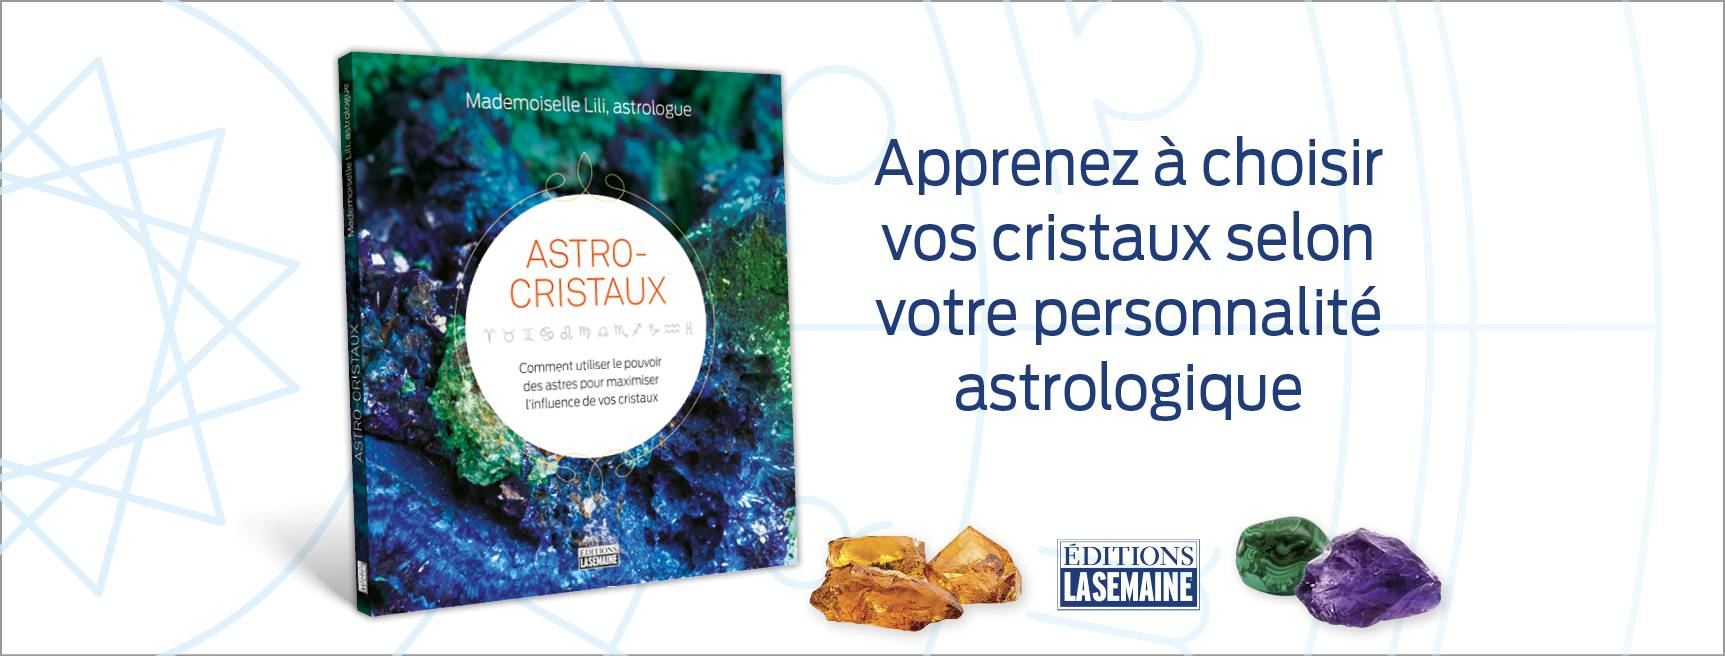 Astro-Cristaux Mademoiselle Lili